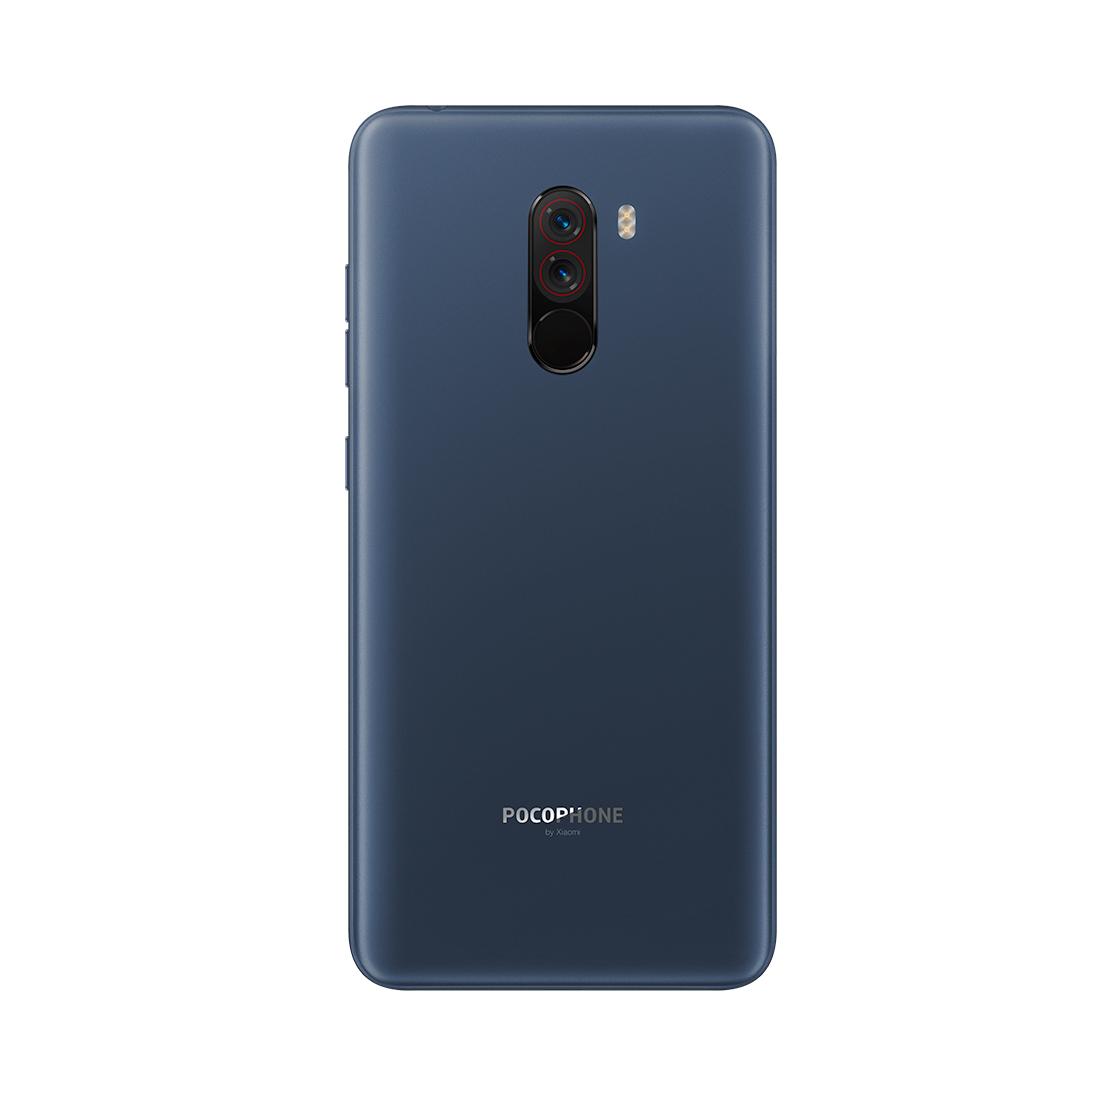 Мобильный телефон Pocophone by Xiaomi F1 (M1805E10A) 64GB Синий